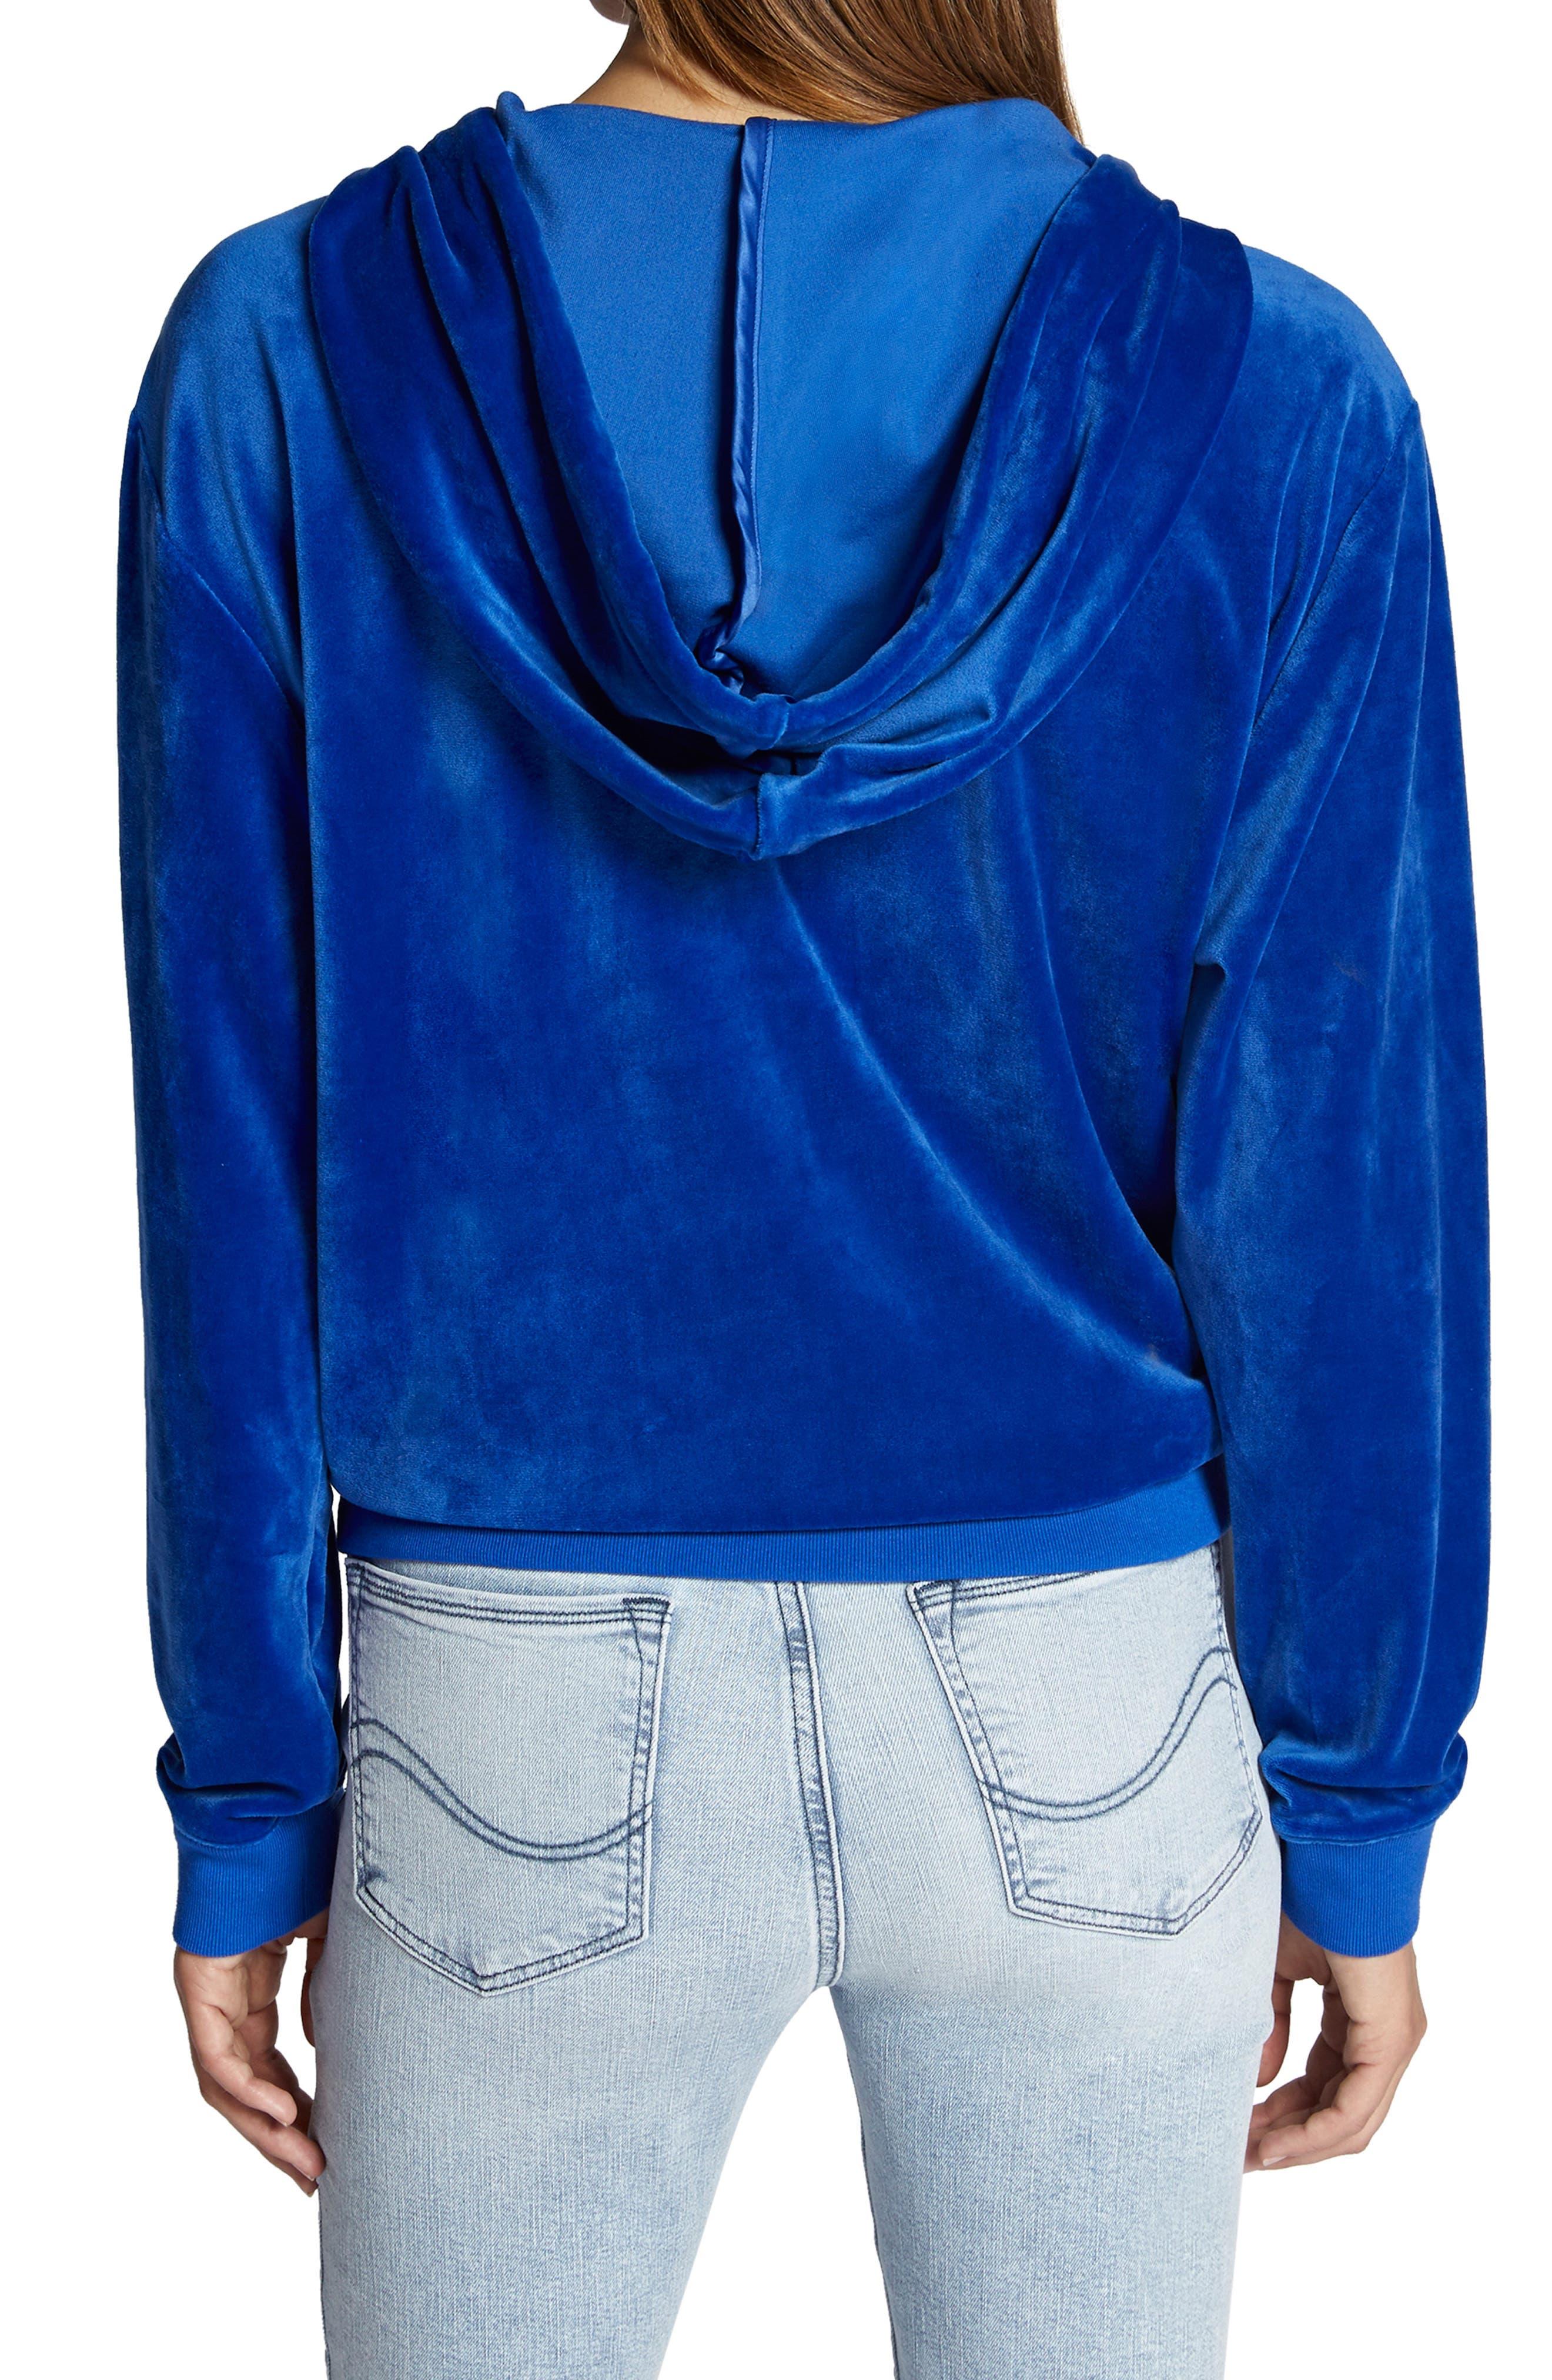 Melrose Raisin Hooded Jacket,                             Alternate thumbnail 2, color,                             ELECTRIC BLUE